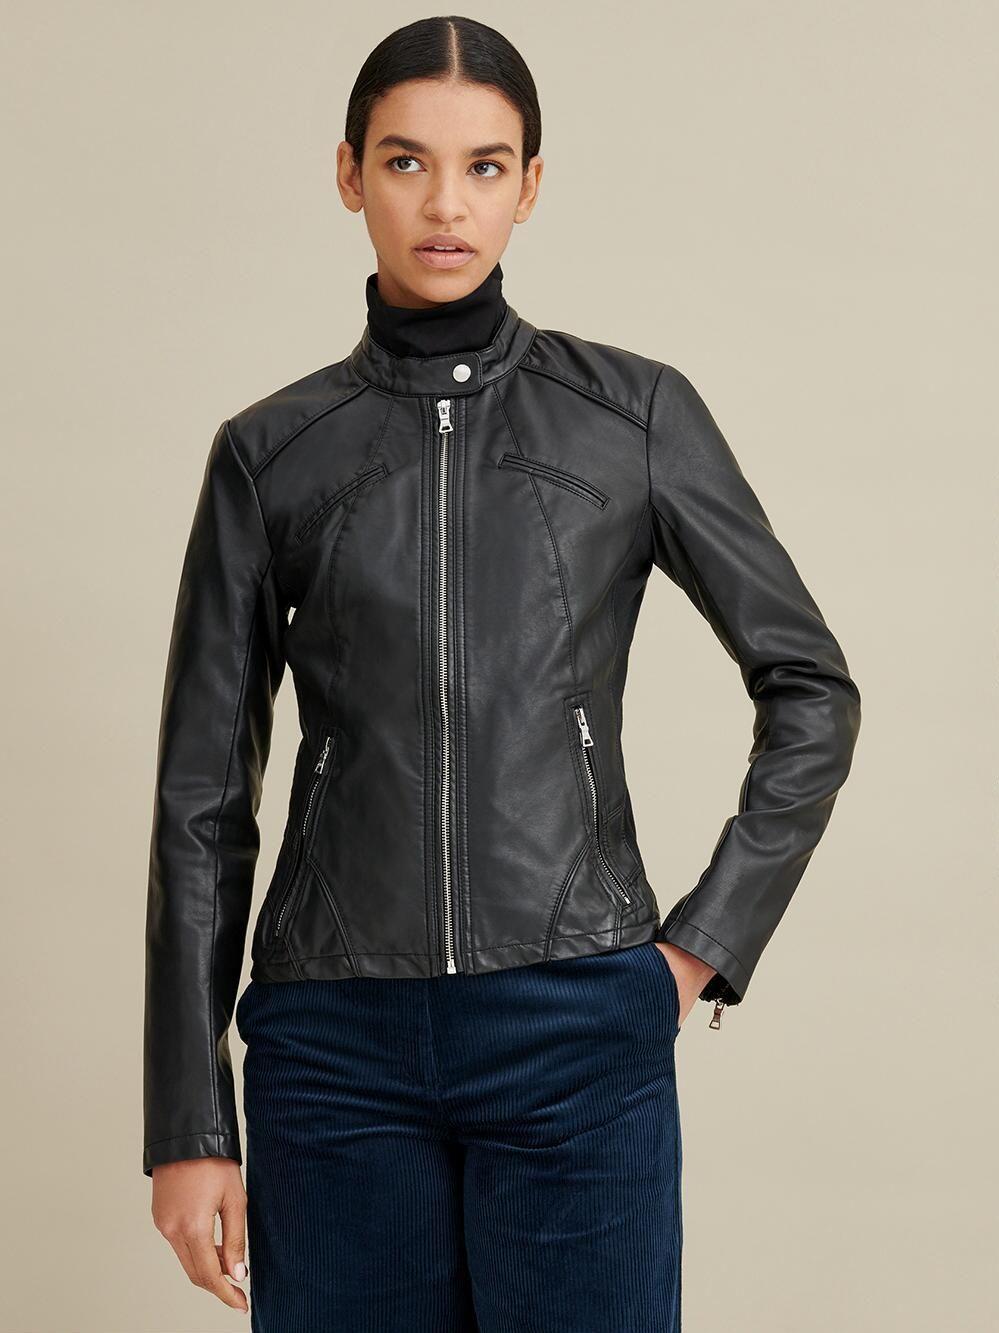 Stella Distressed Leather Jacket Wilsons Leather Leather Jackets Women Distressed Leather Jacket Scuba Jacket [ 1333 x 999 Pixel ]